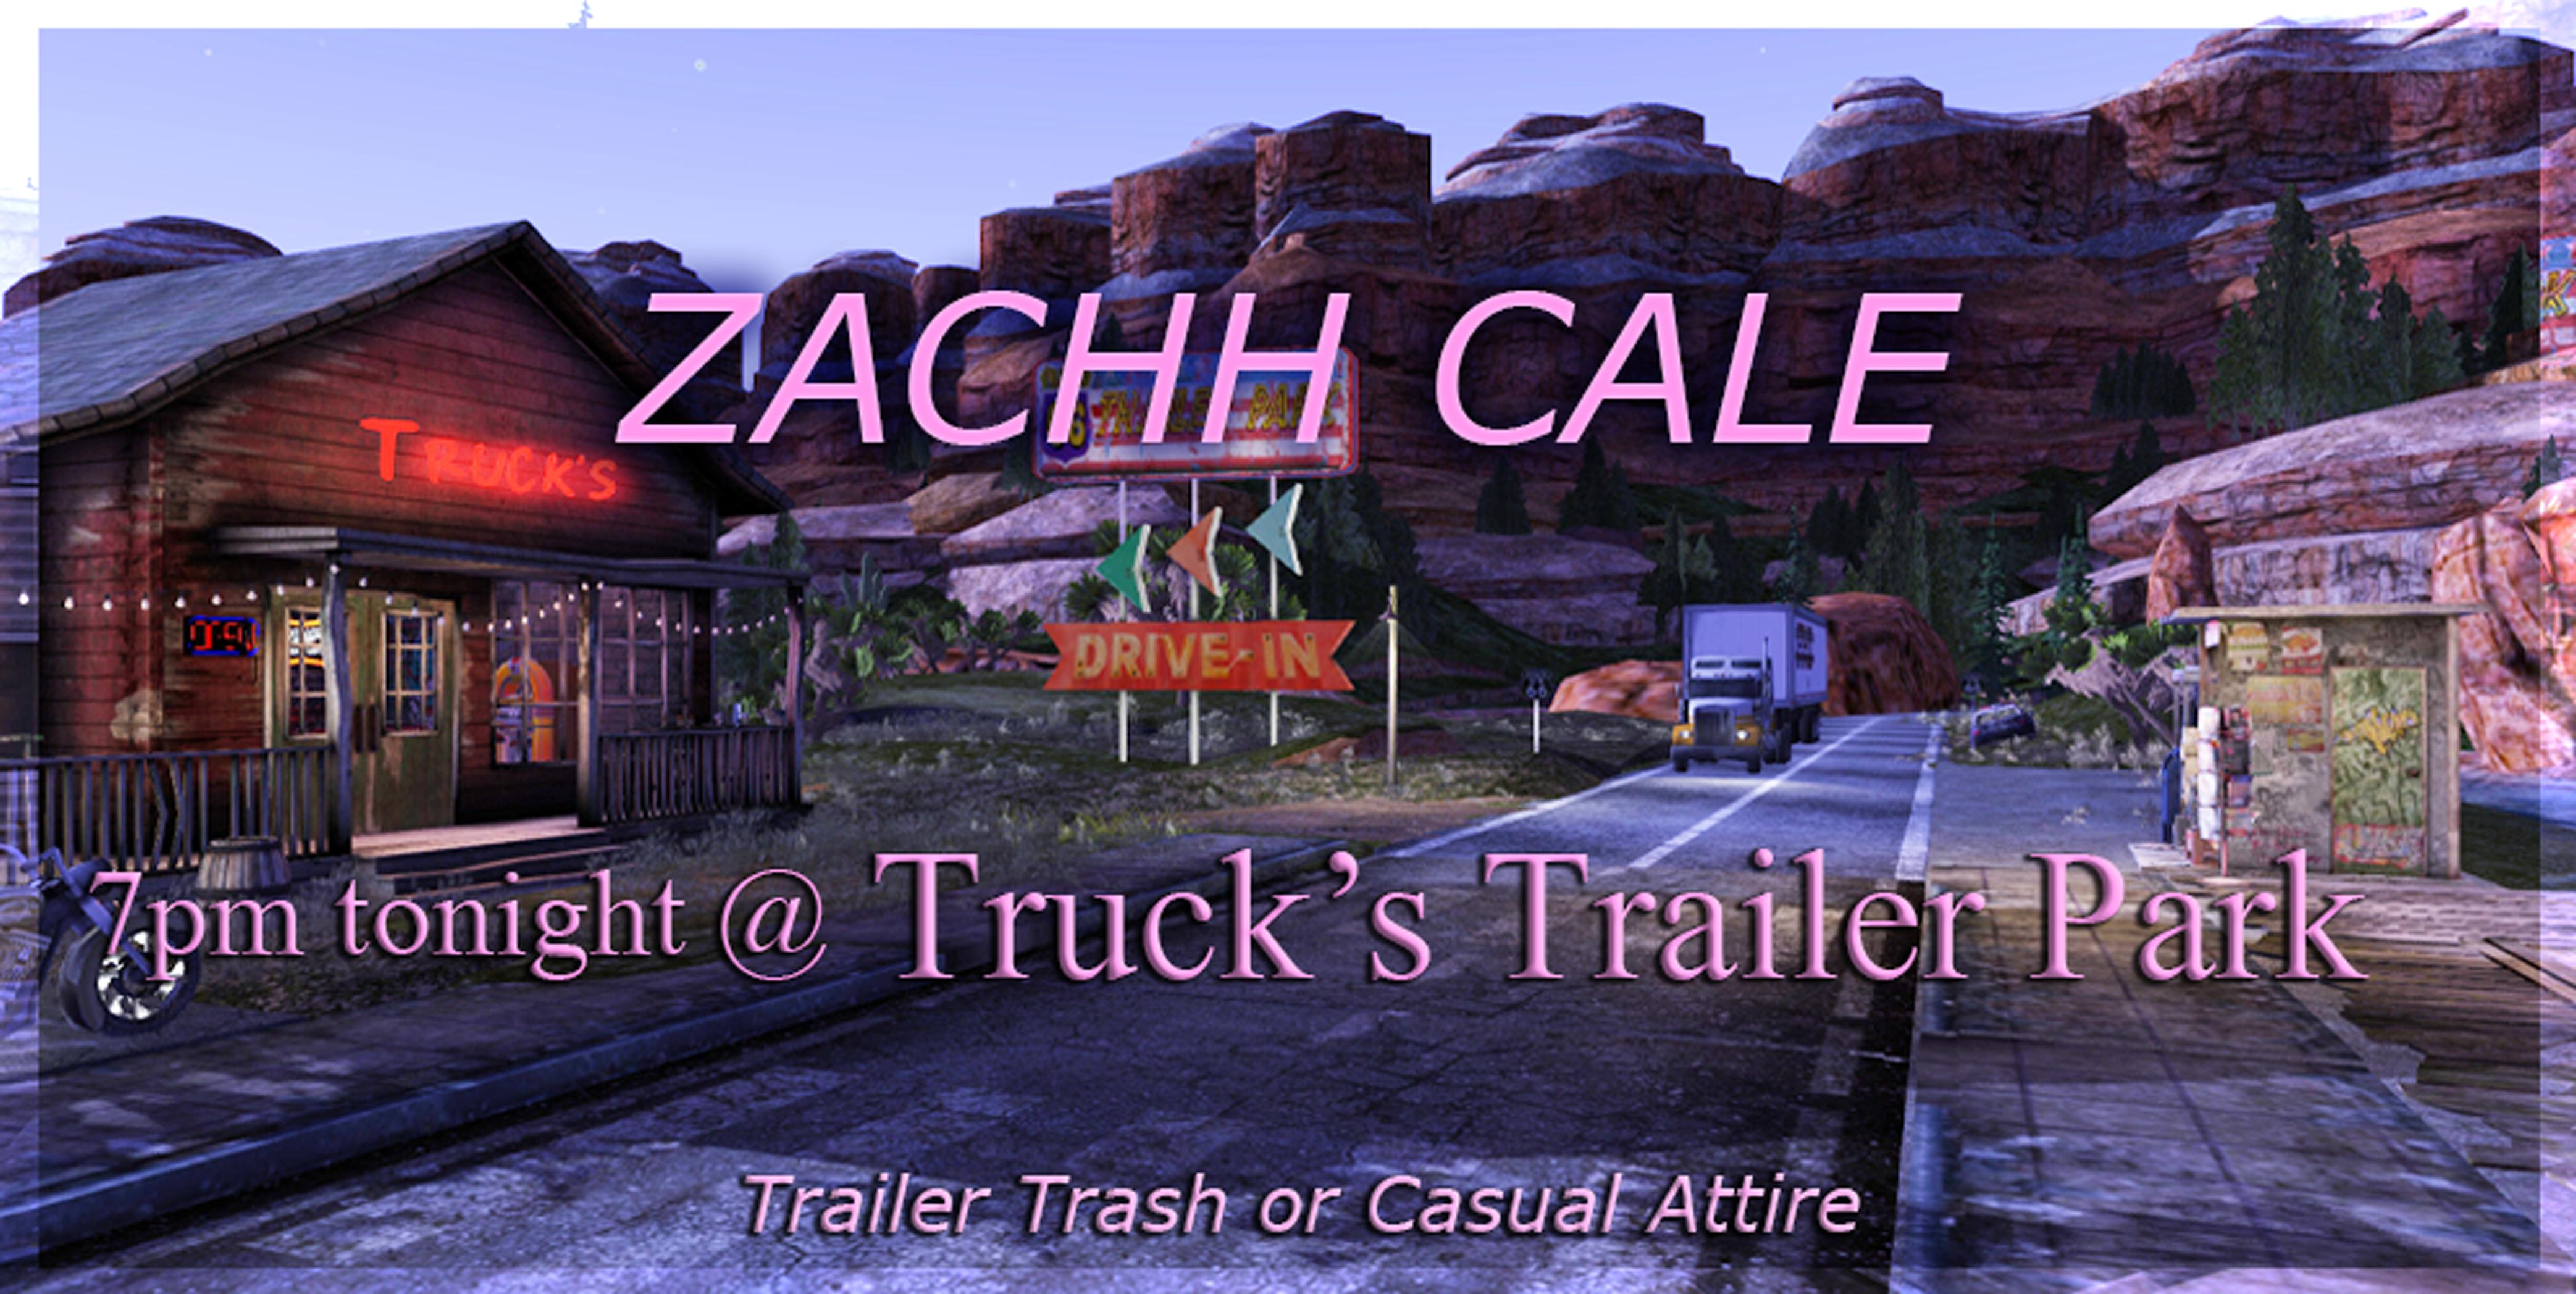 Trailer Park poster Zachh 2